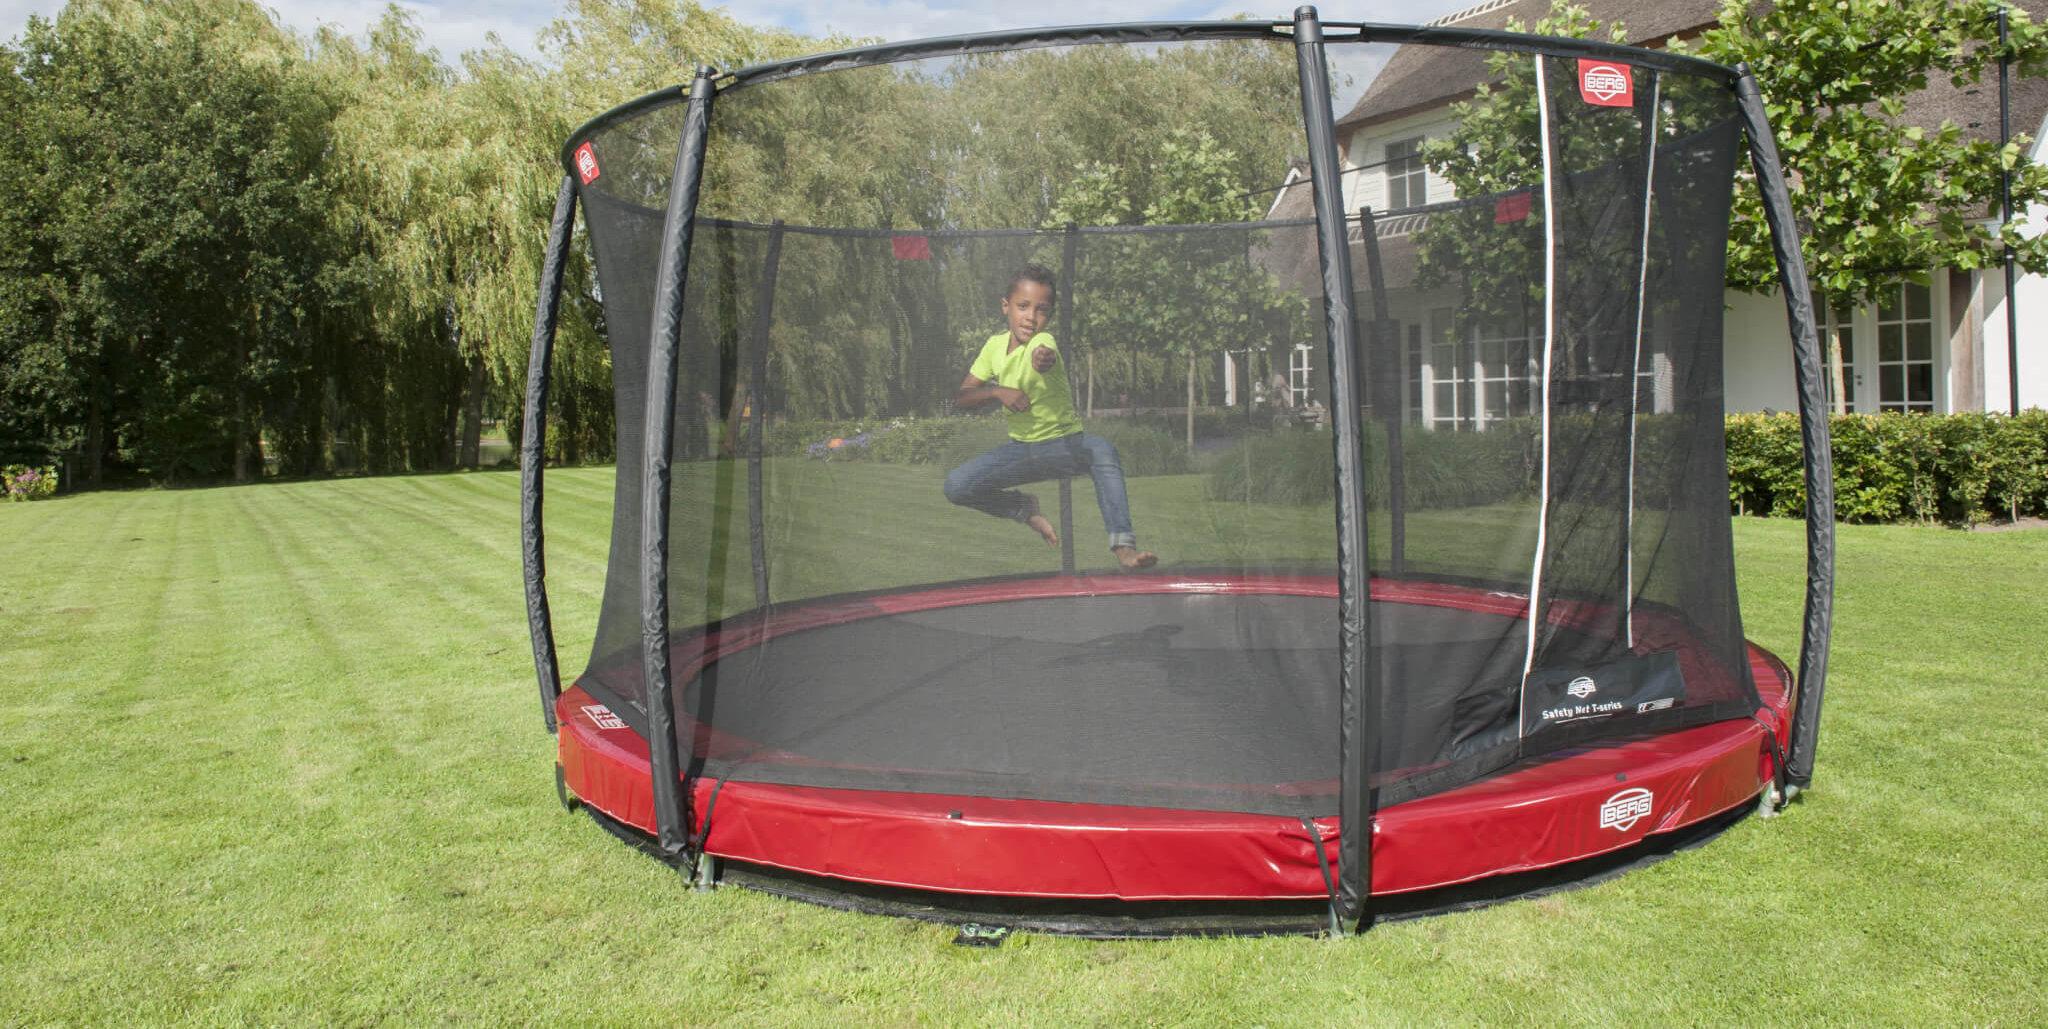 Tipps für den Trampolinkauf - Ratgeber trampolin-profi.de - Jahresrückblick 2019 bei TRAMPOLIN PROFI